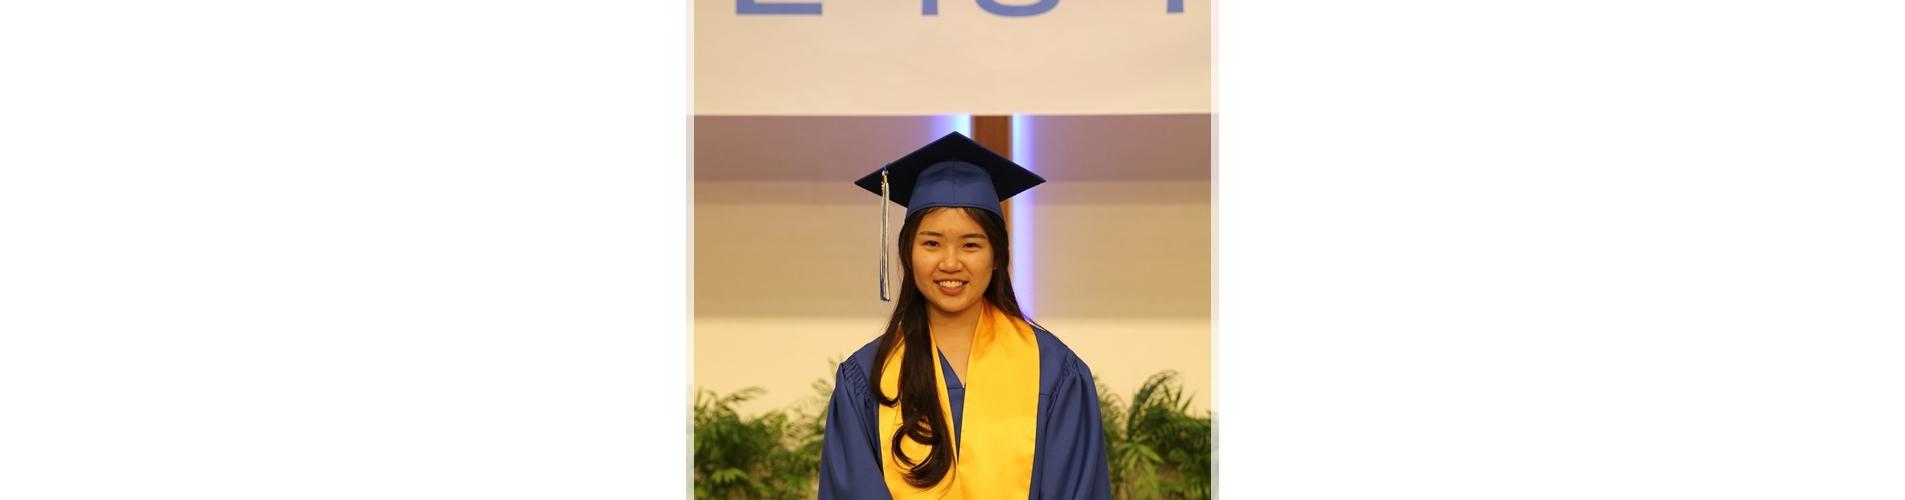 2016-06-24 ECS 제2회 졸업식